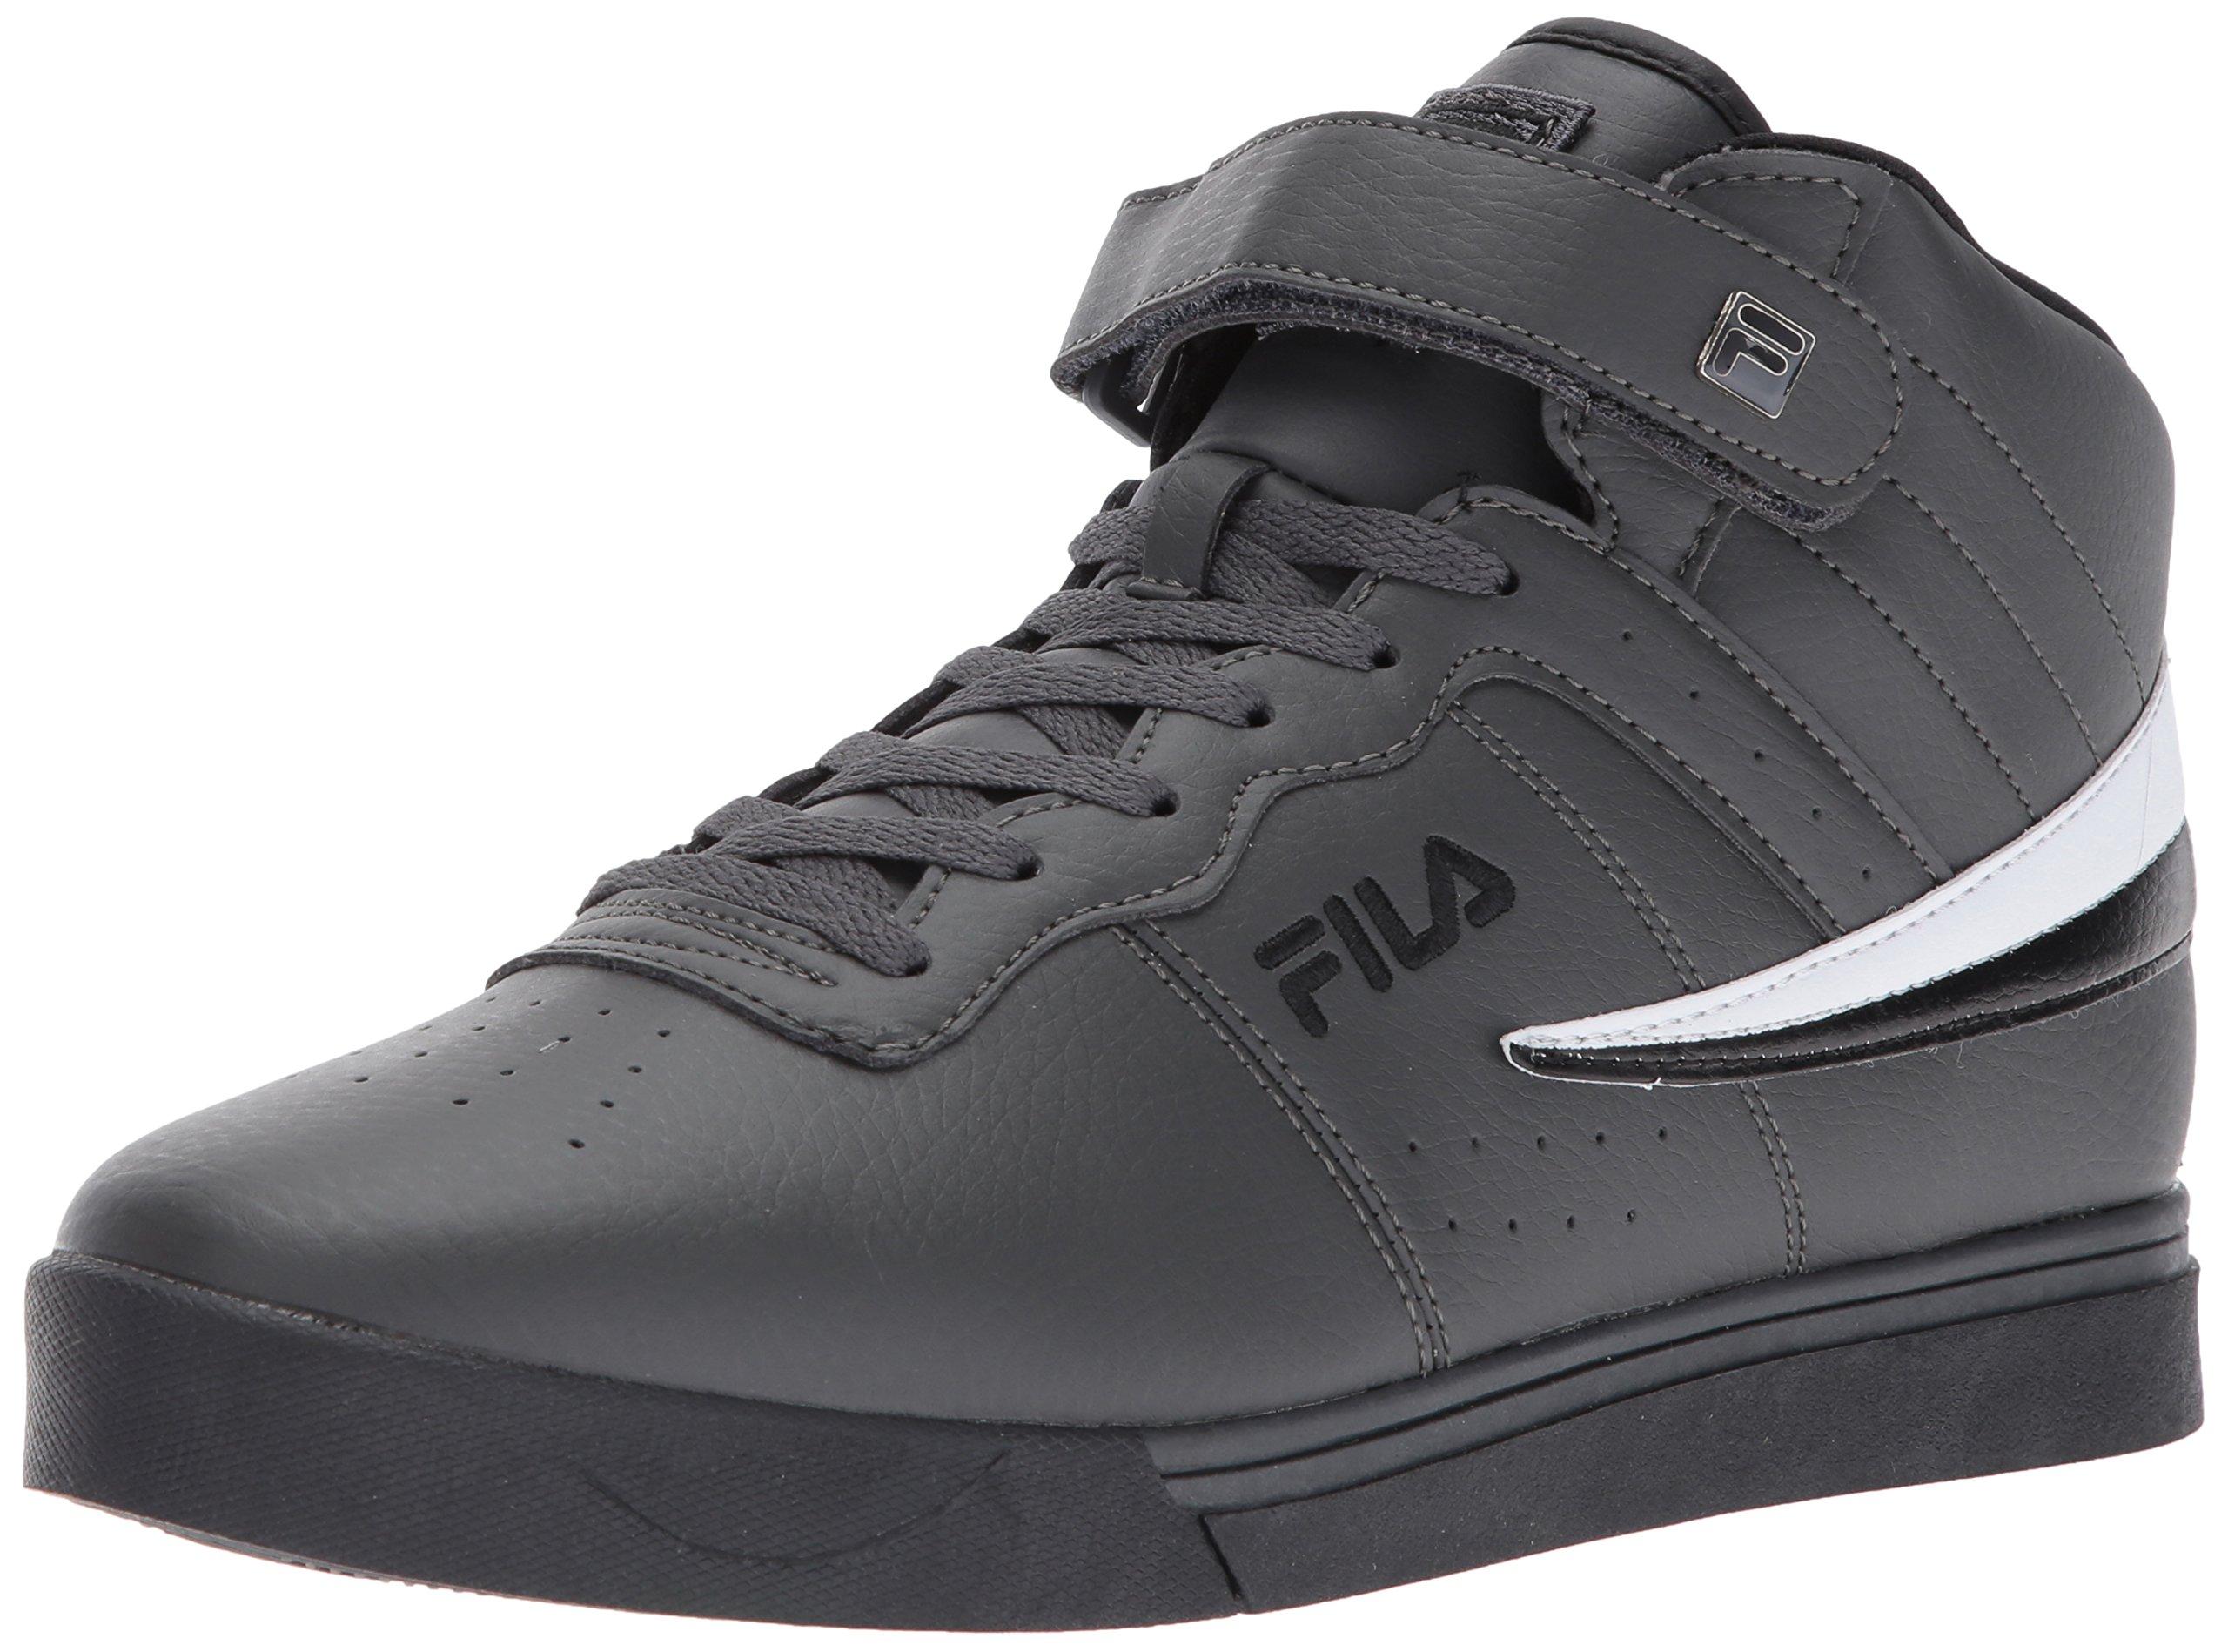 Fila Men's Vulc 13 Mid Plus 2 Walking Shoe, Dark Shadow/Black/White, 10 D US by Fila